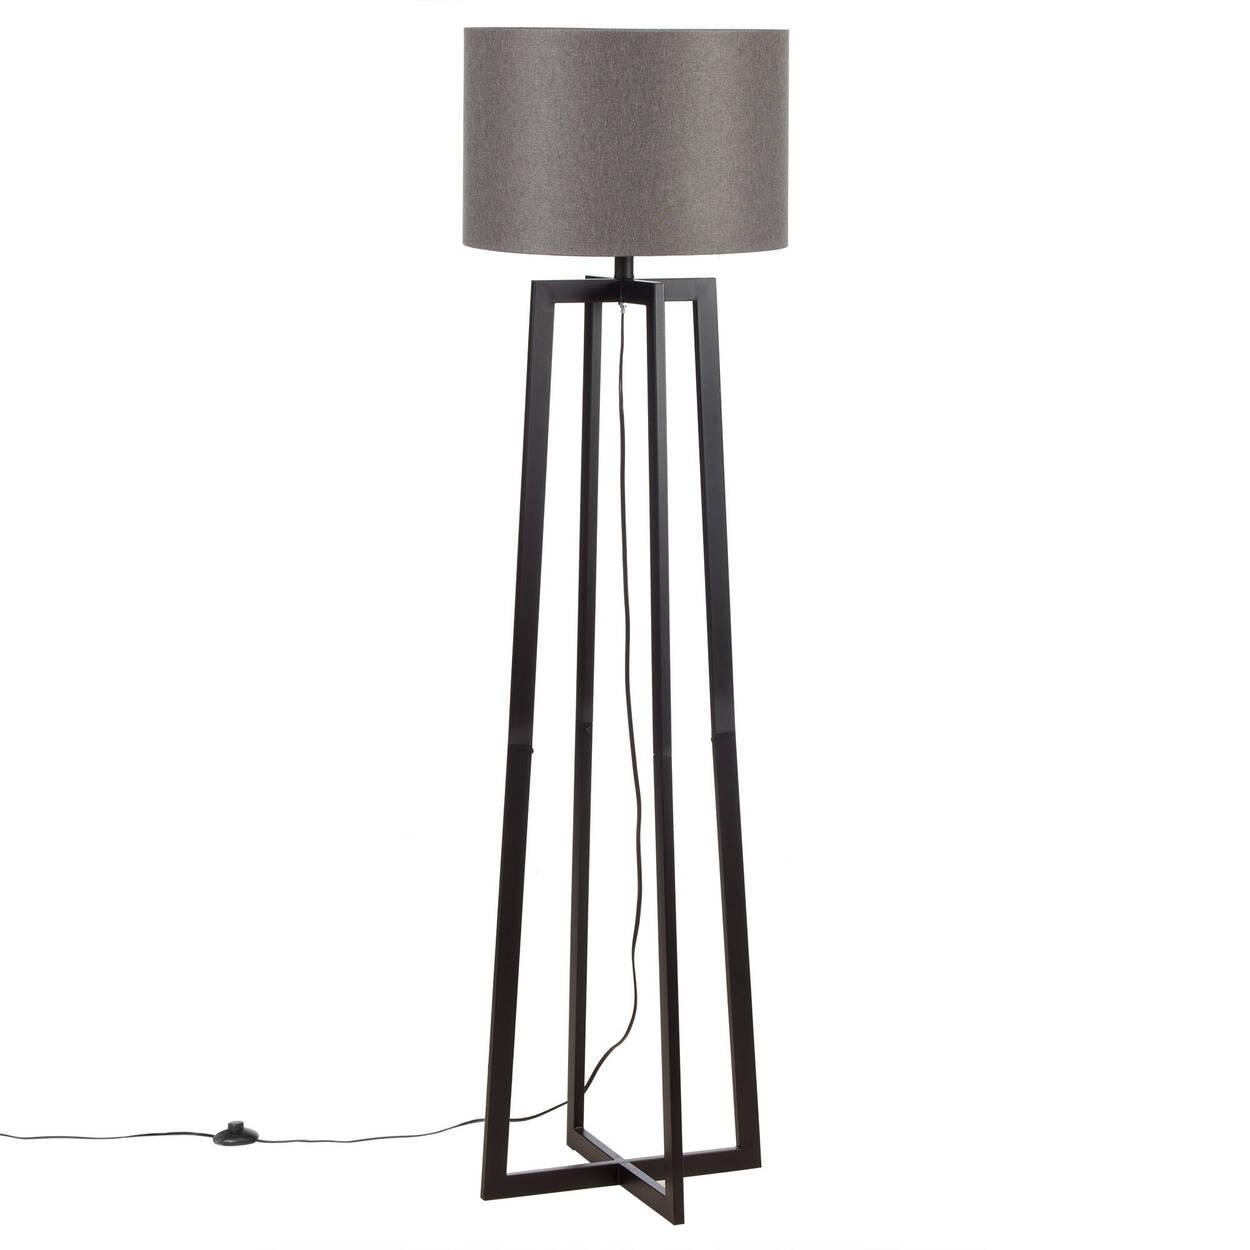 Geometric Metal Floor Lamp